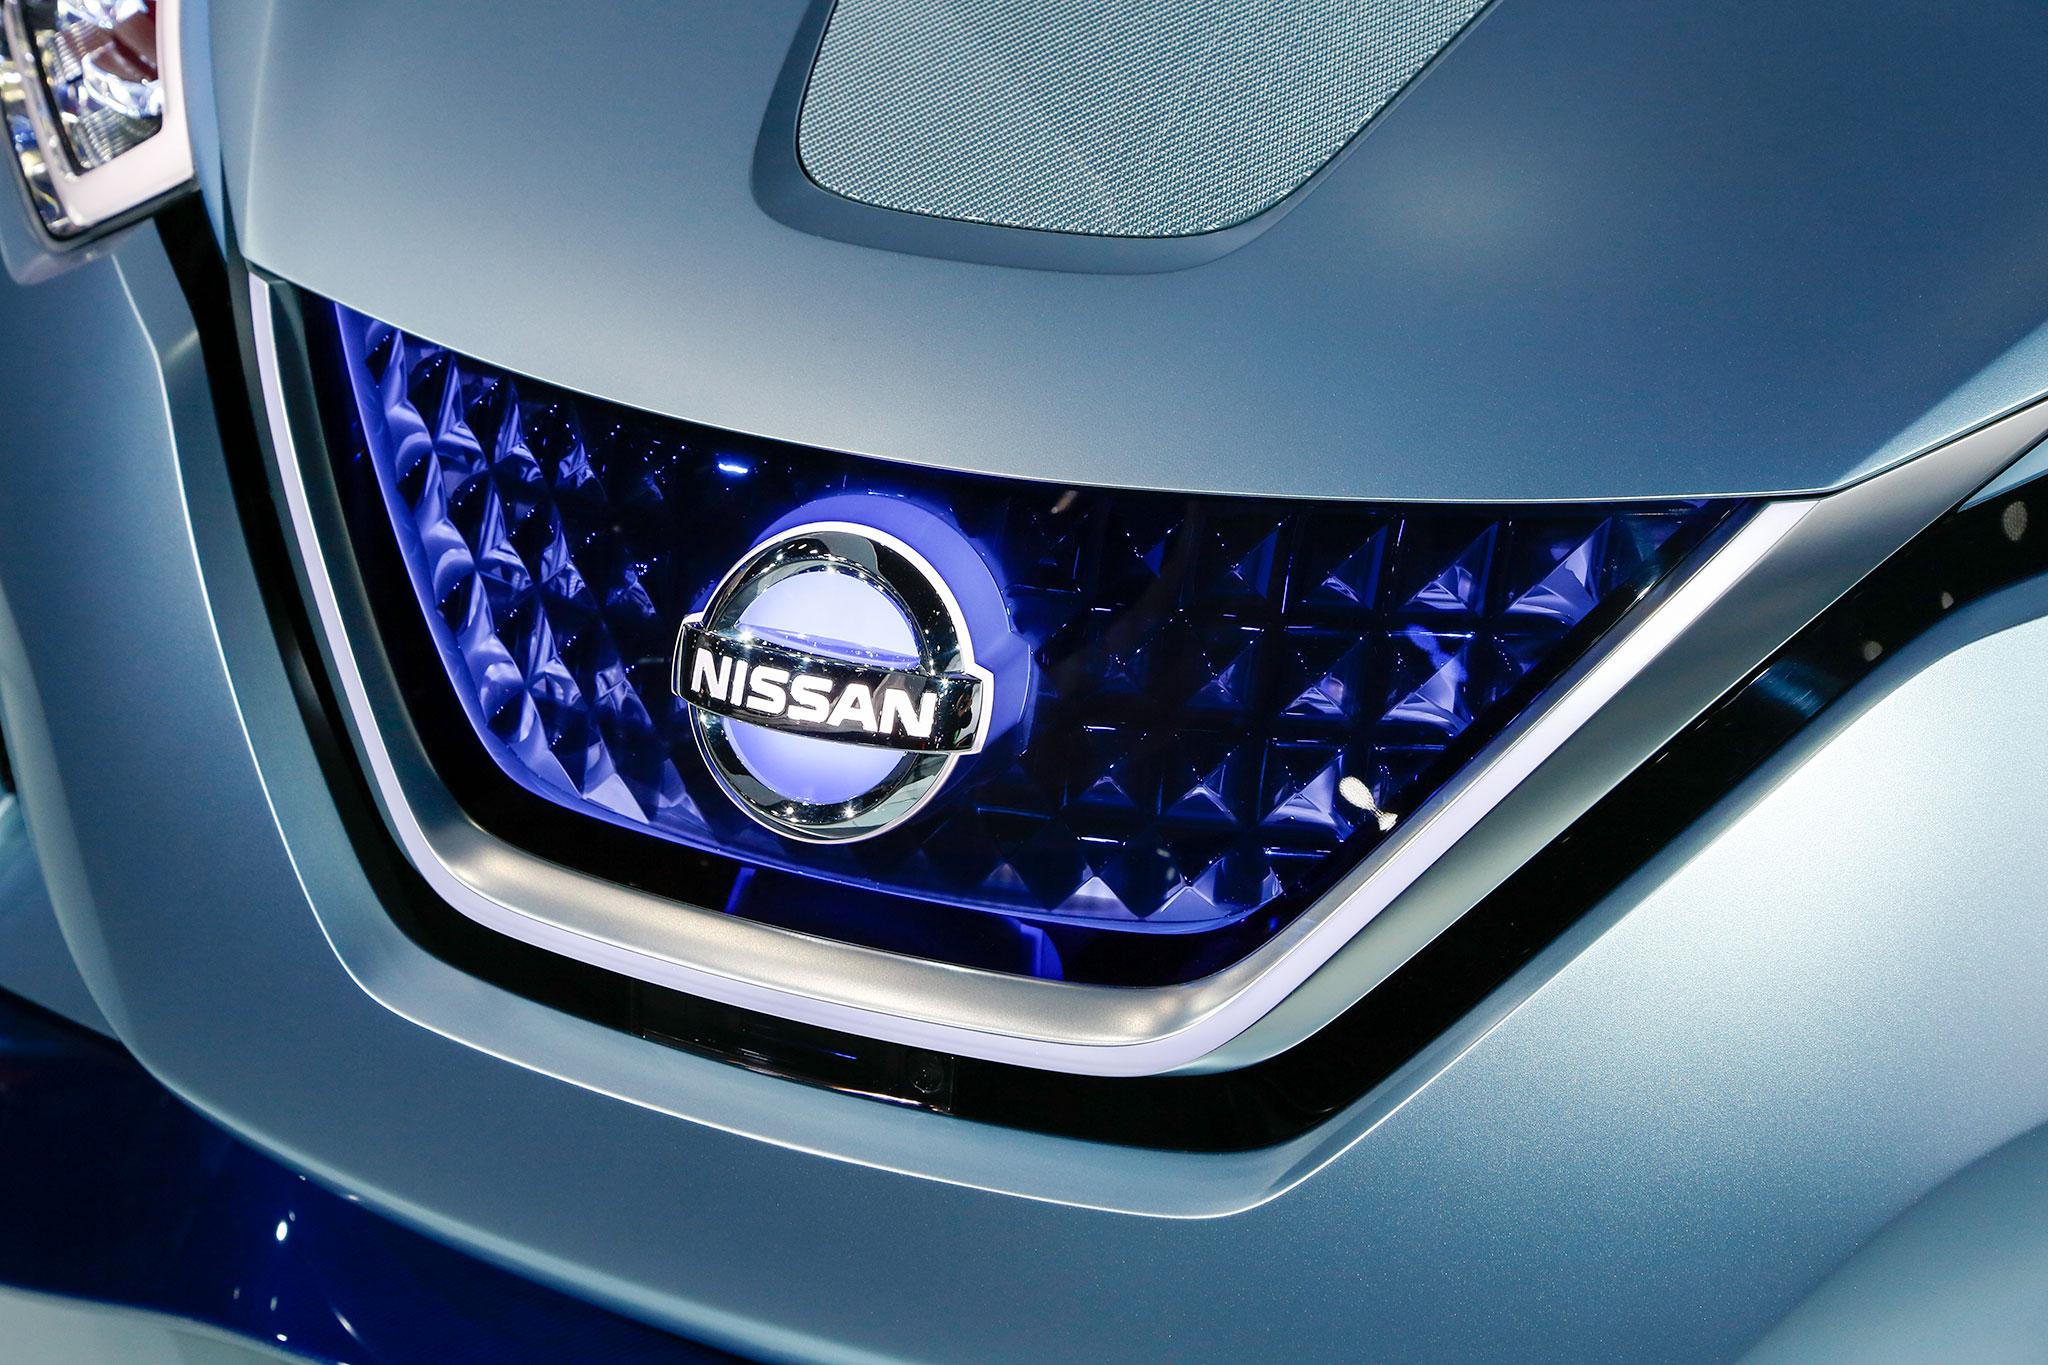 Nissan IDS Concept Grille